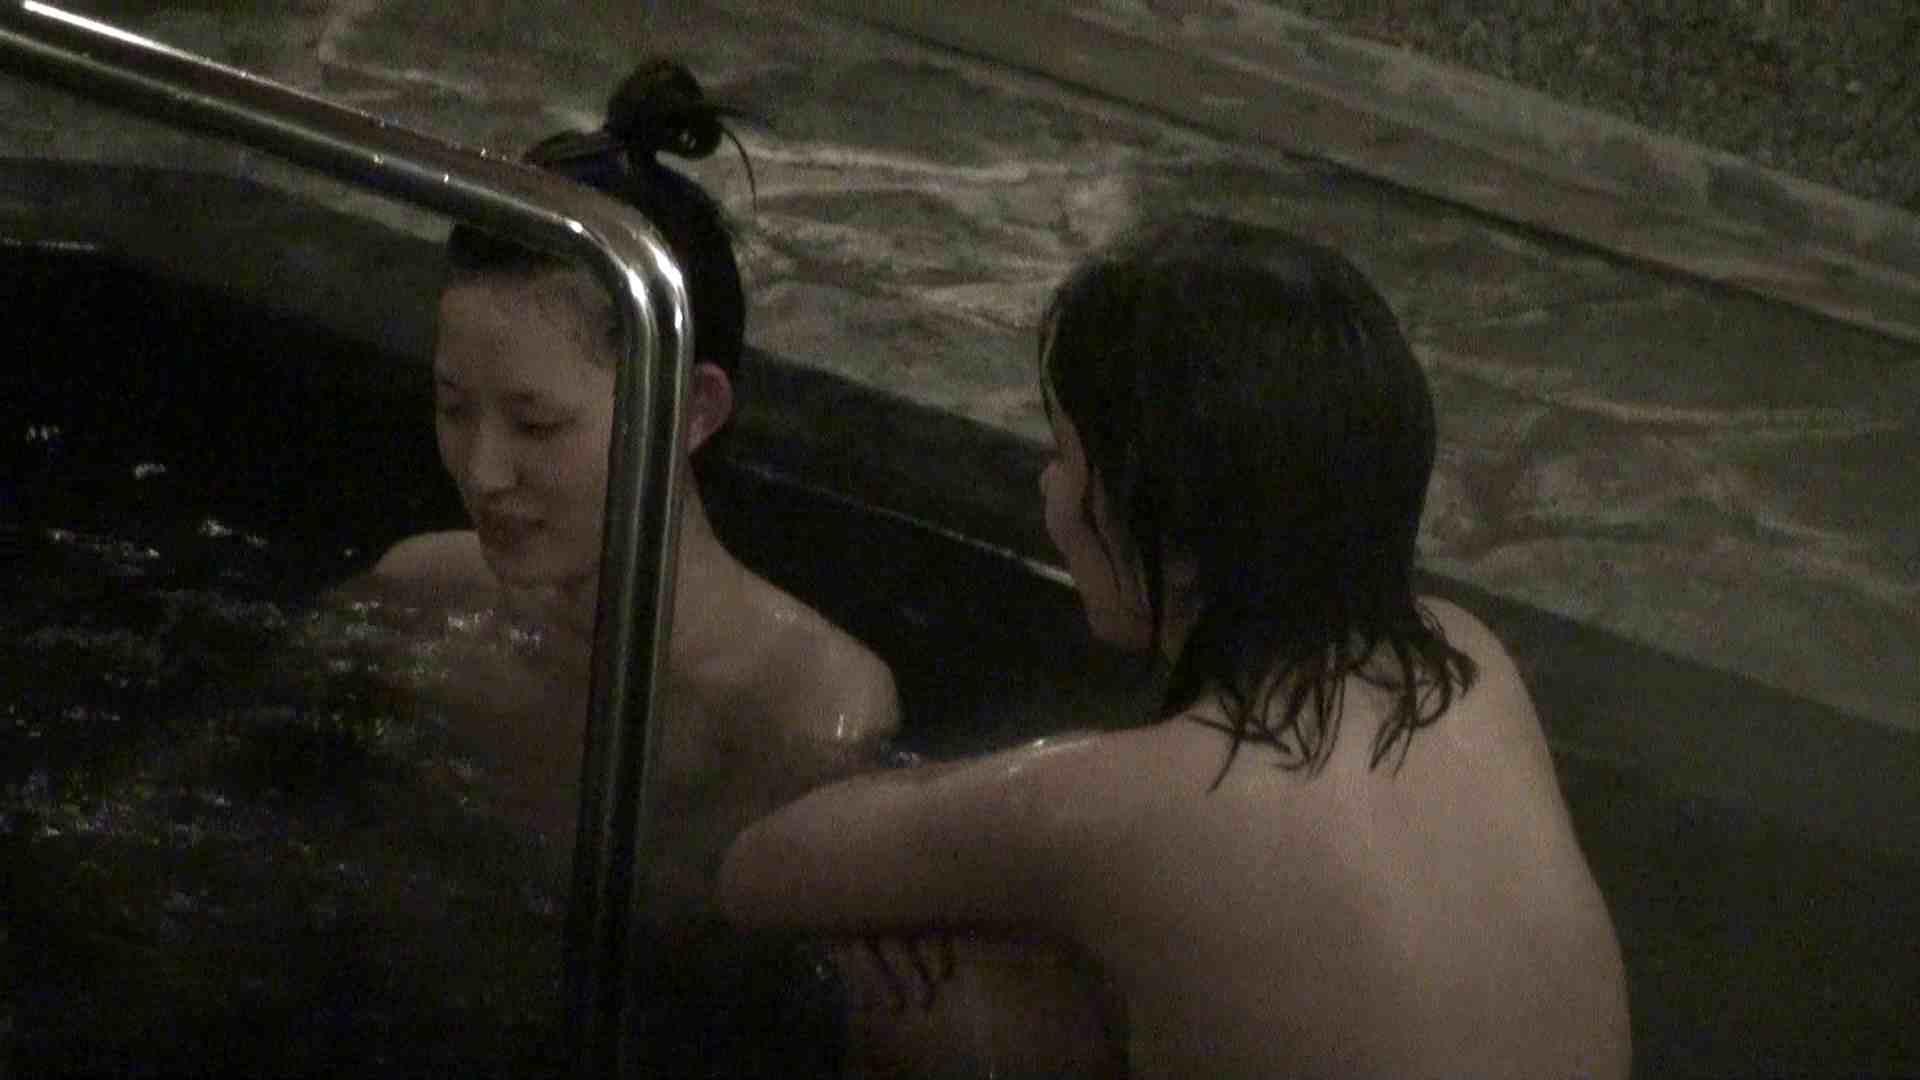 Aquaな露天風呂Vol.363 盗撮 | OLセックス  90画像 4